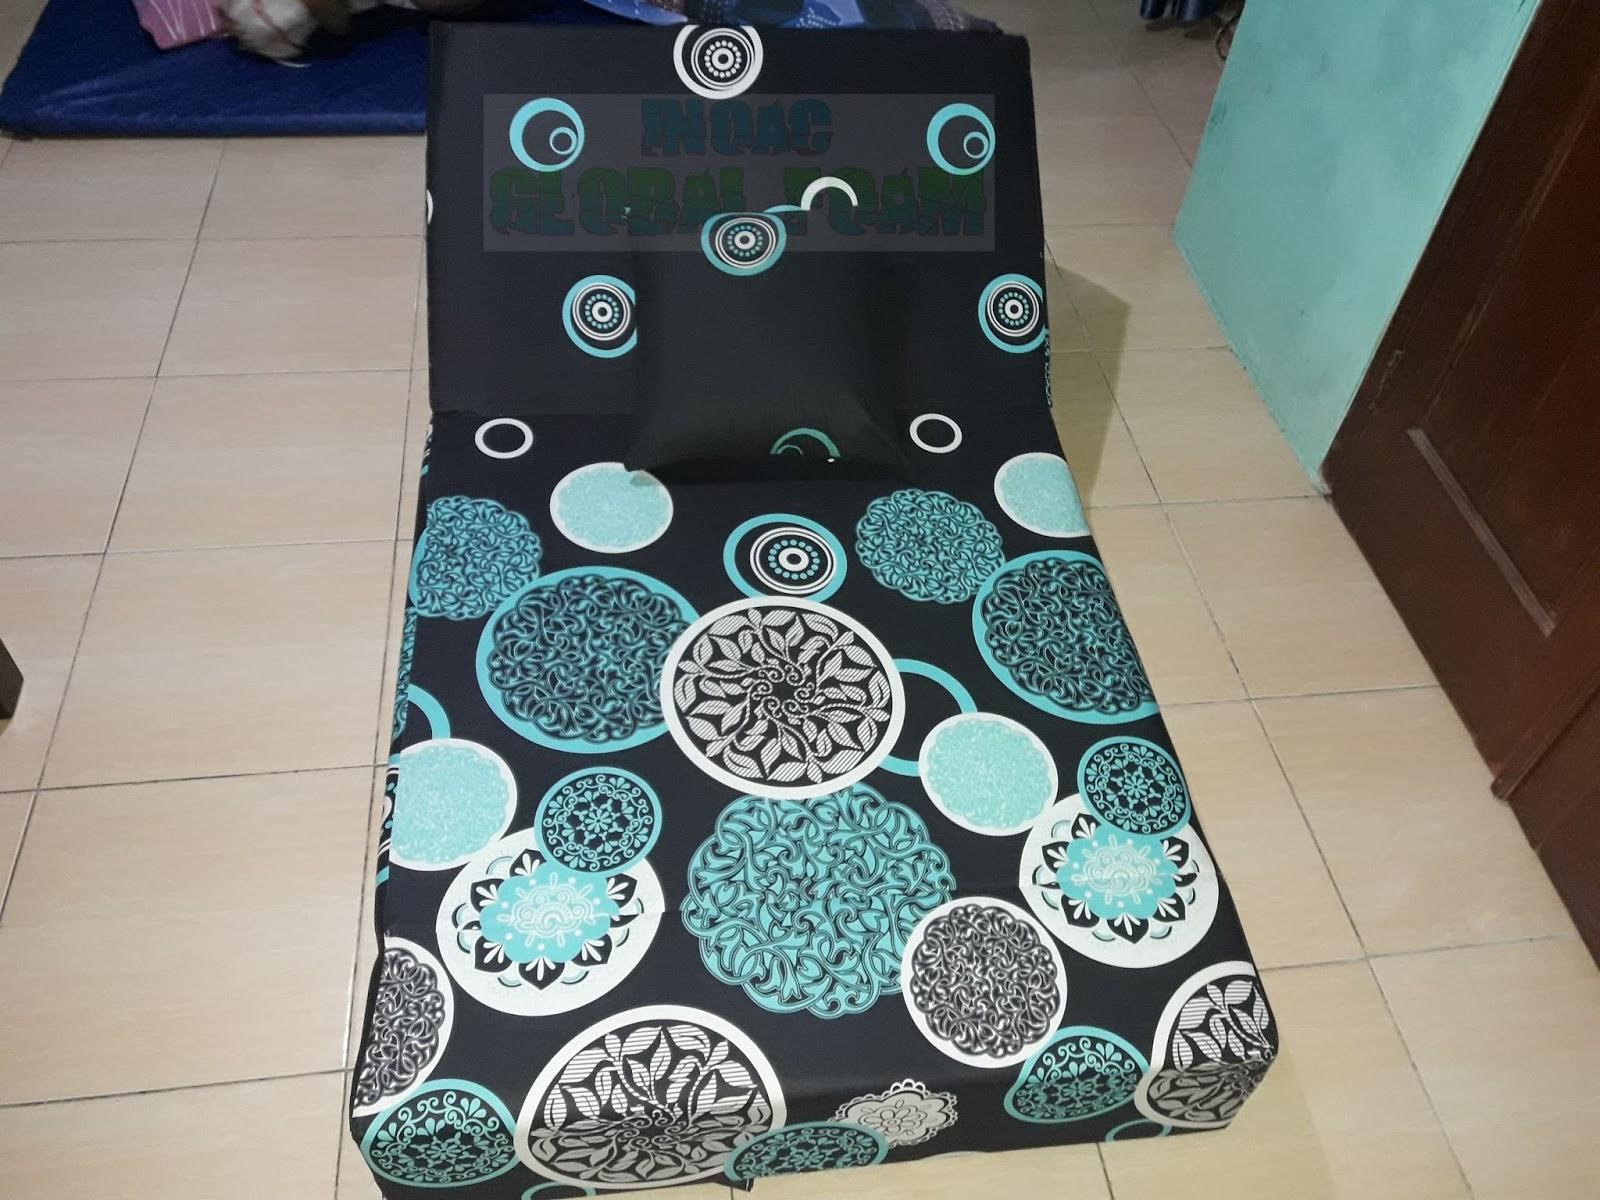 harga sofa bed inoac 2017 mart waterloo ia kasur 2018 distributor dan agen resmi